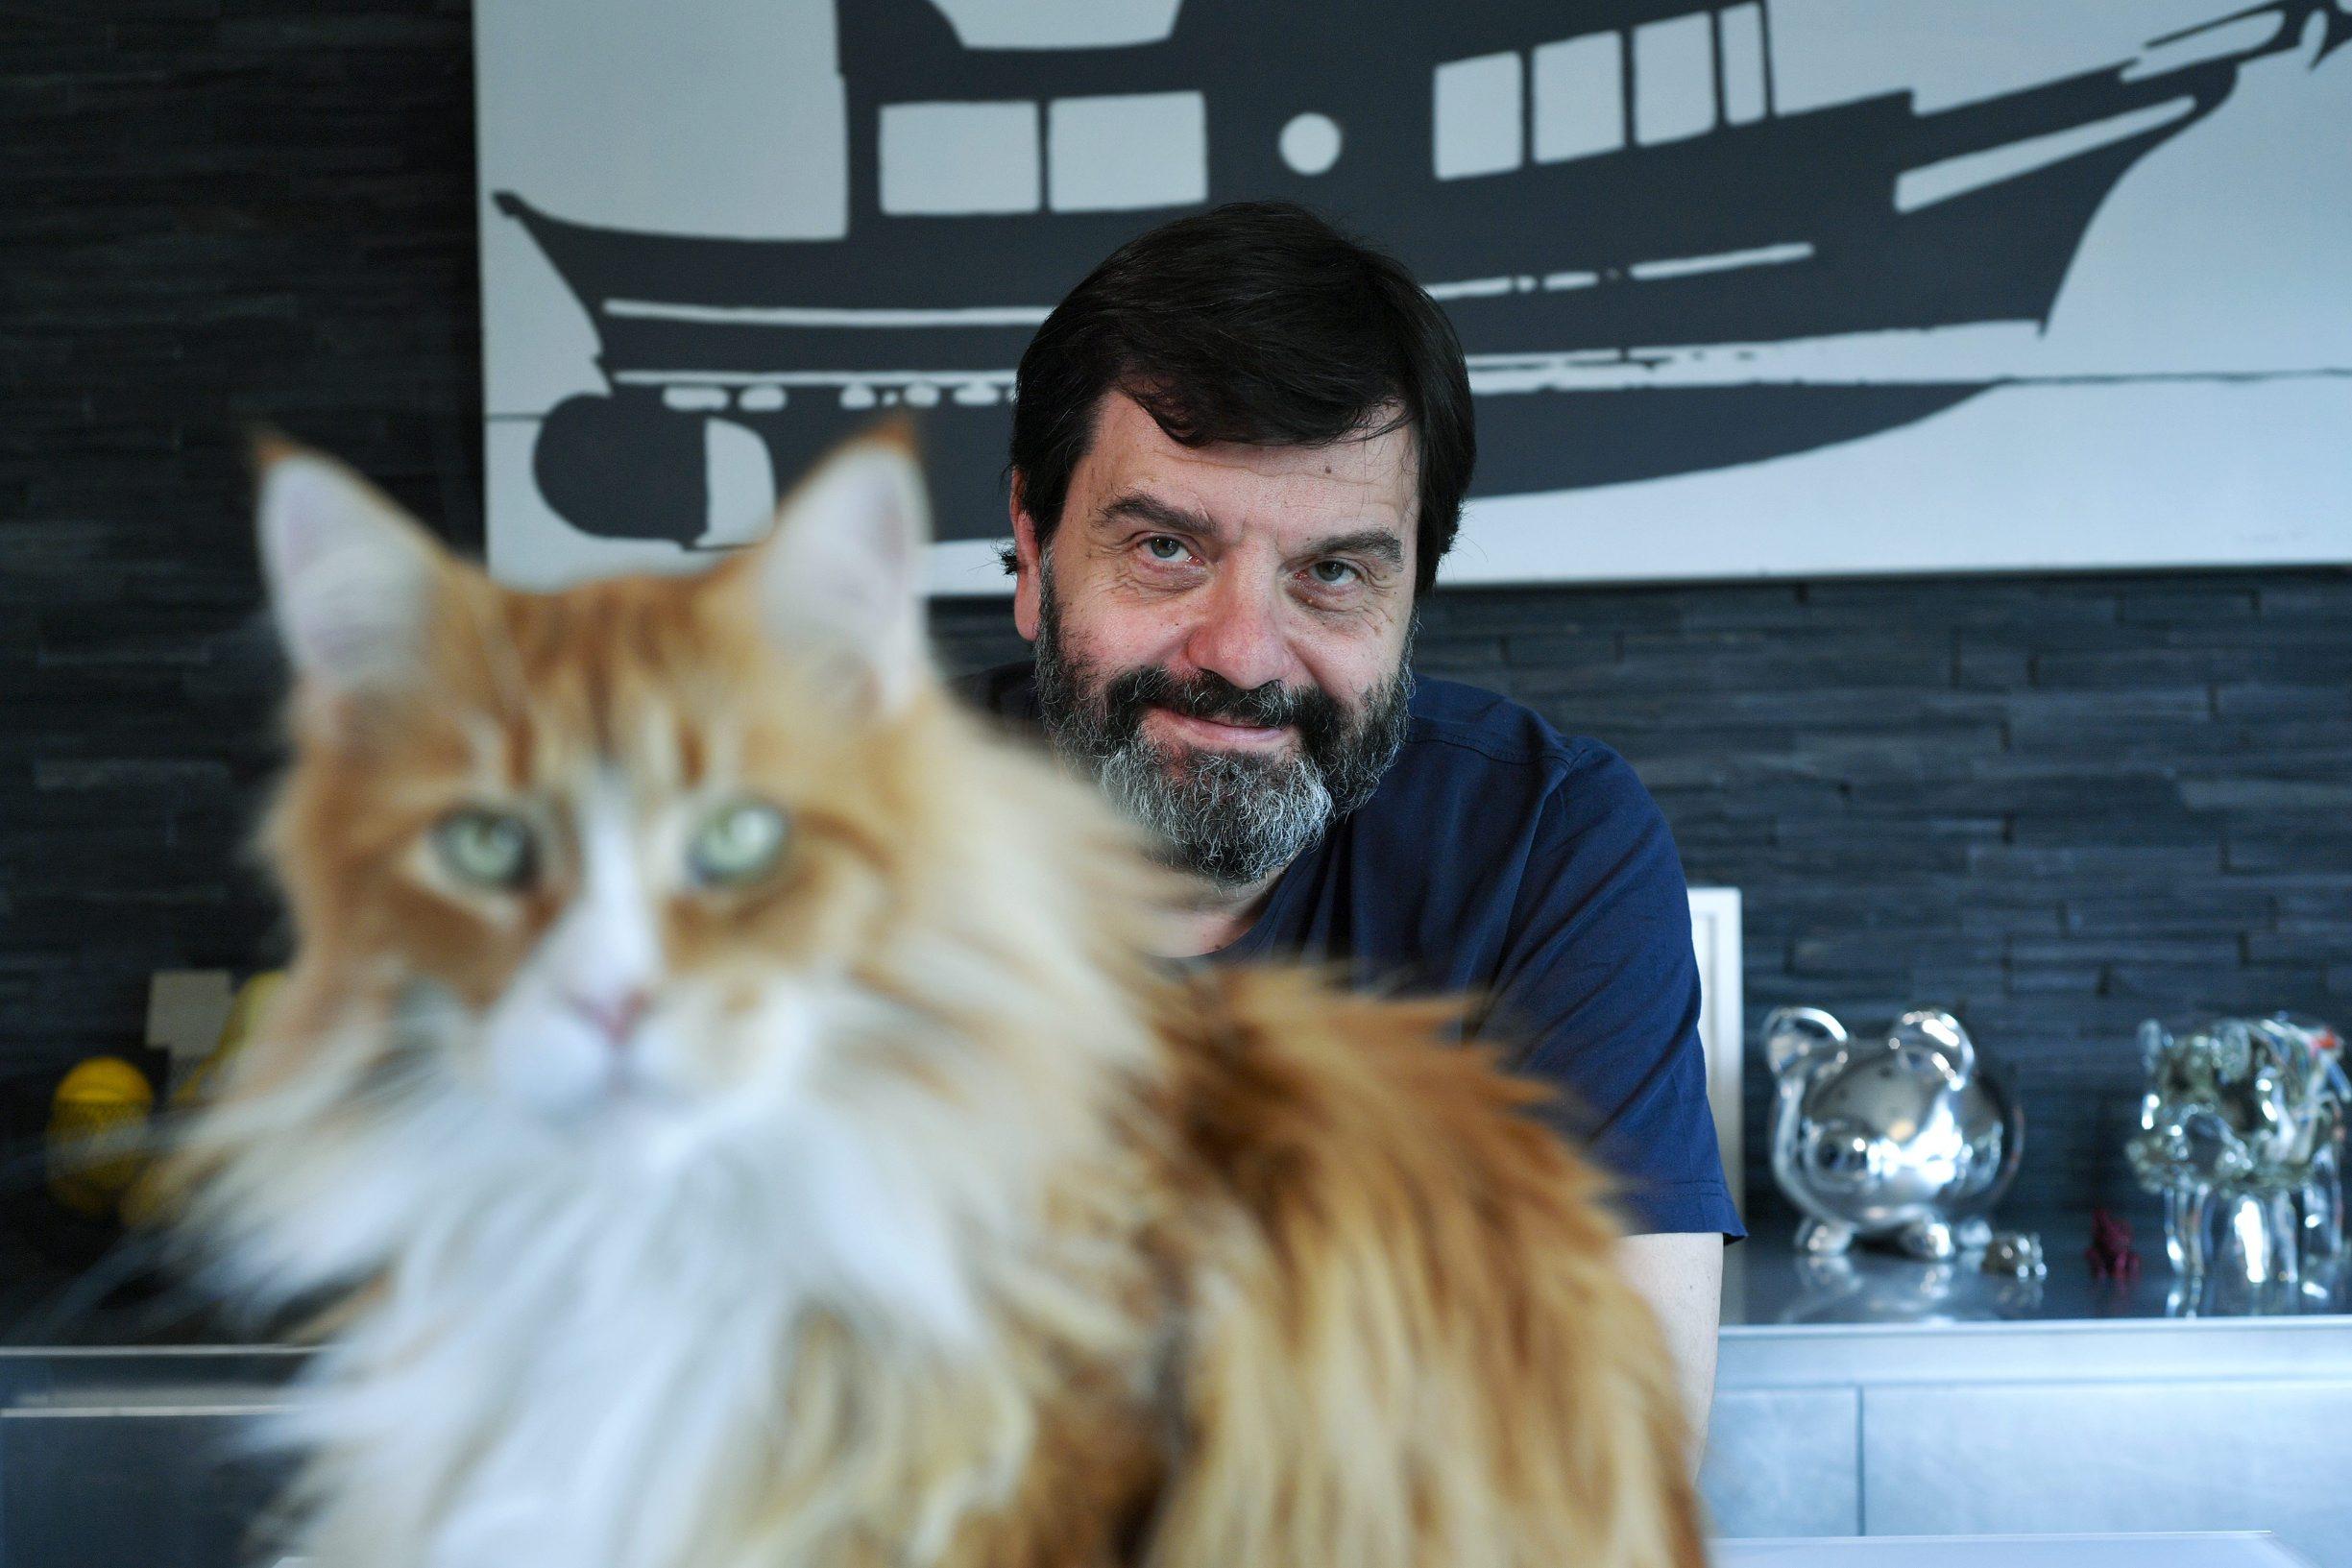 Zagreb, 280519. Srpski redatelj Mladen Maticevic, fotografiran u stanu Ivane Soljan. Foto: Boris Kovacev / CROPIX